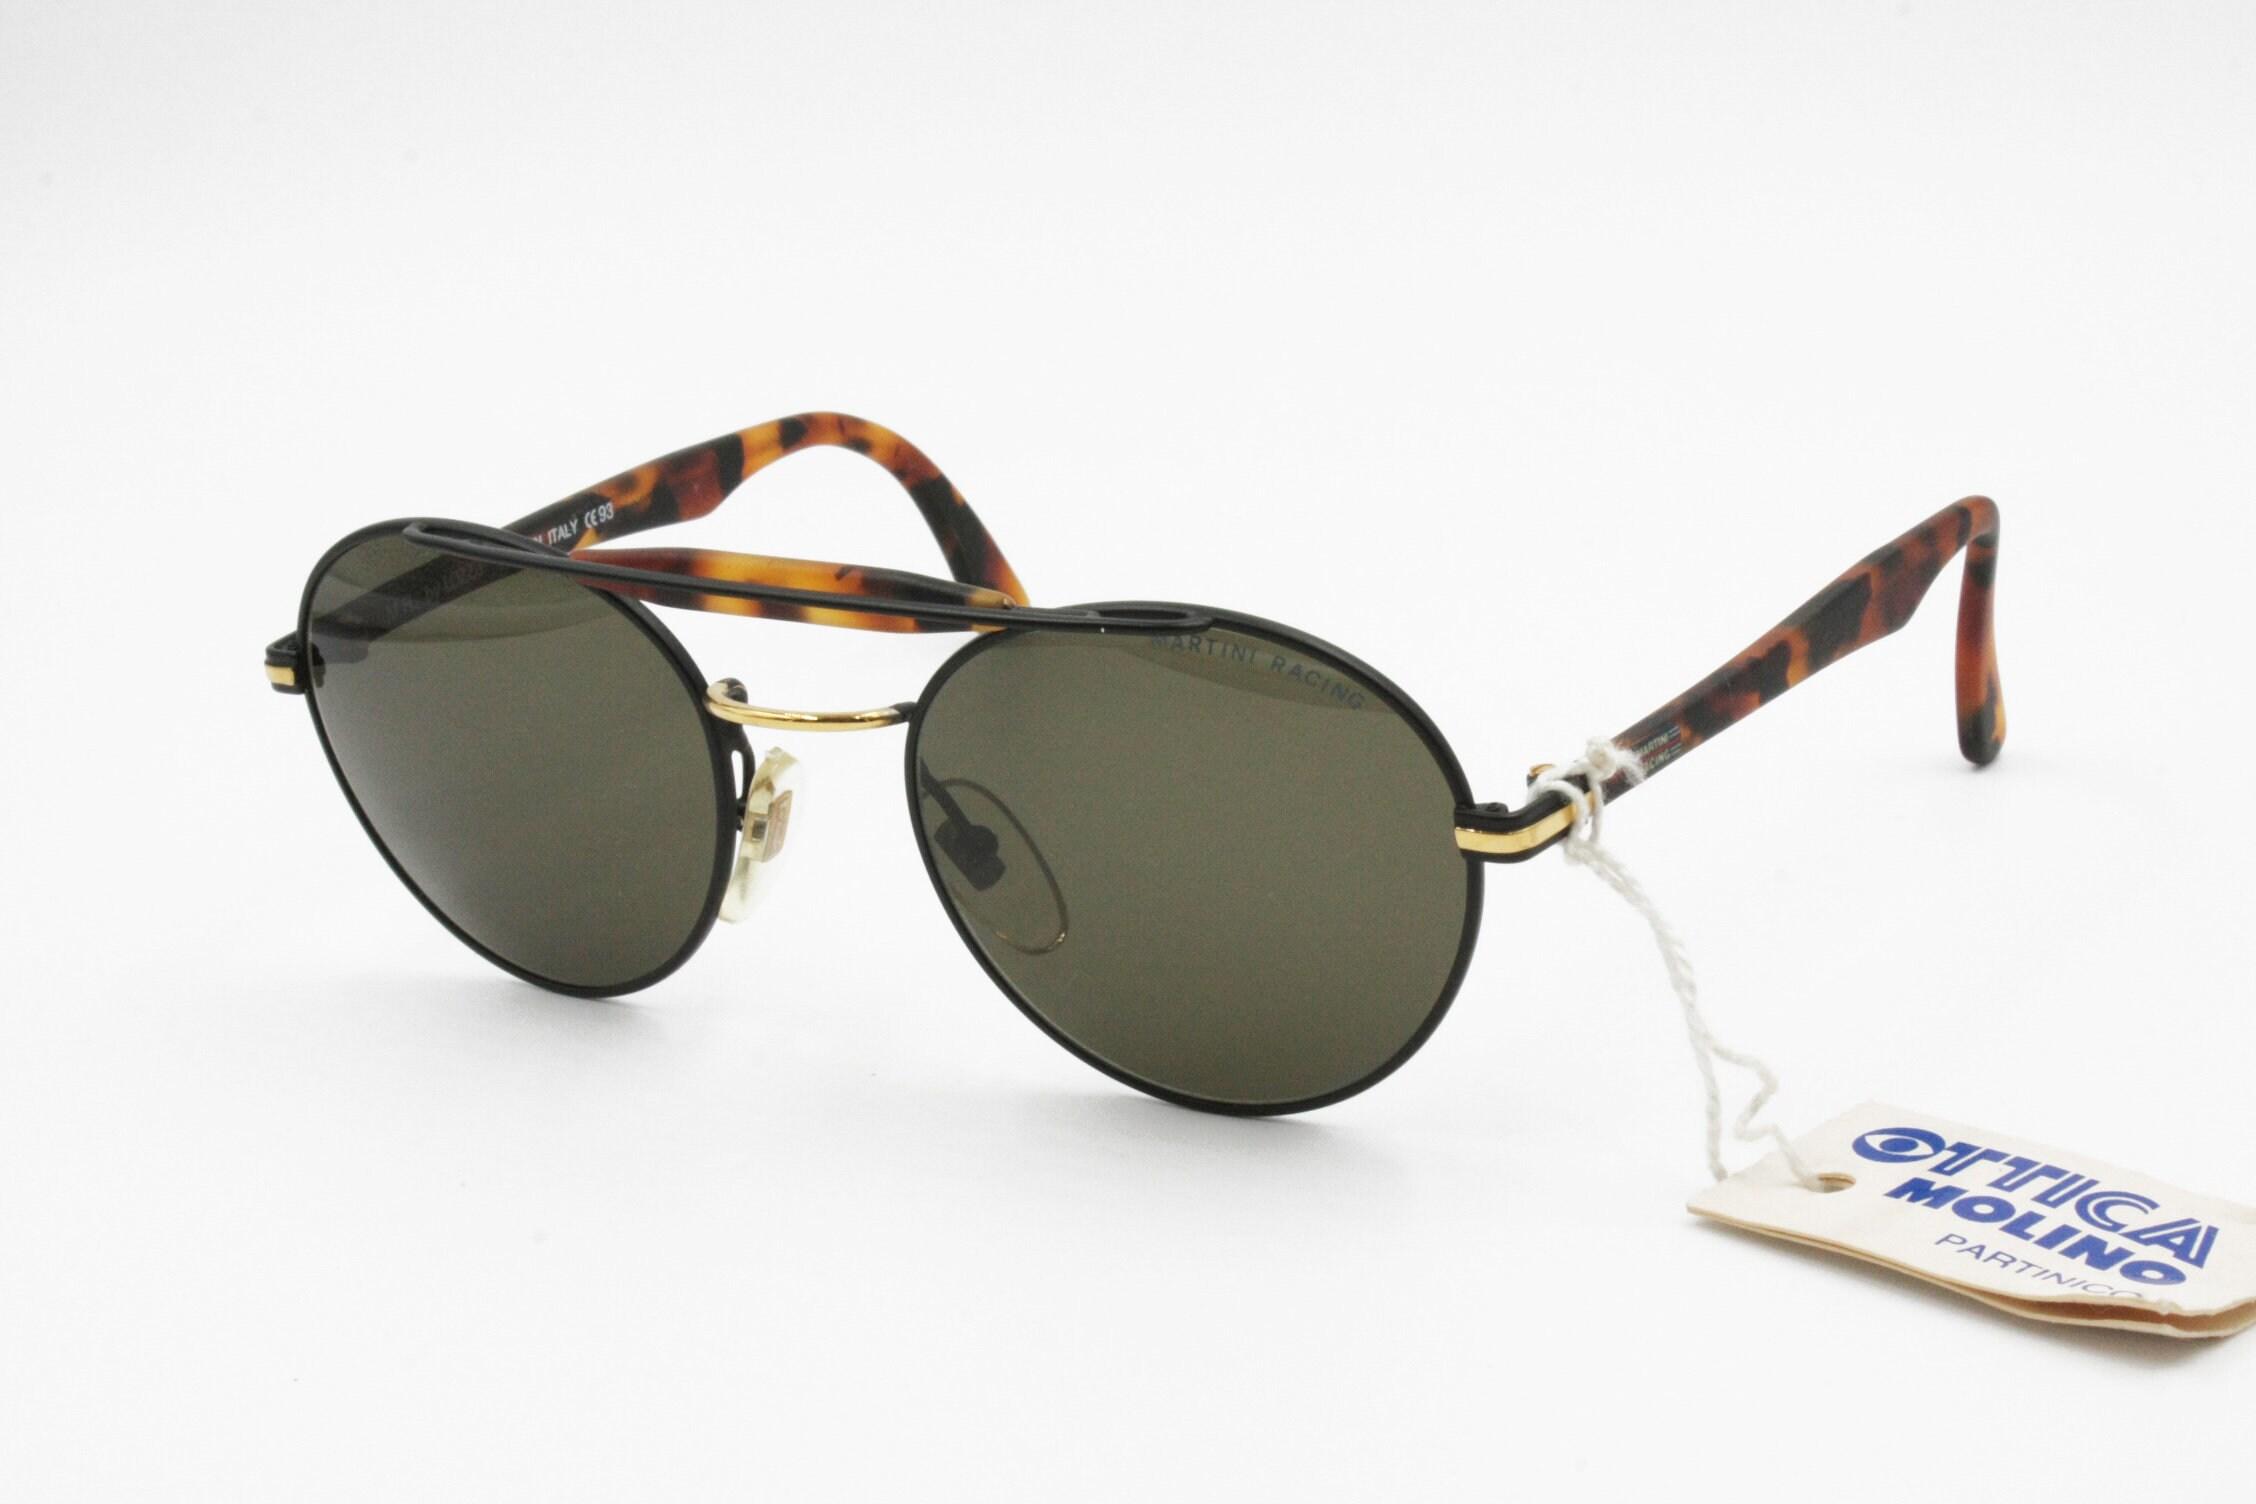 c83a48aa9bc21 Martini Racing by Lozza Aviator Vintage Sunglasses matte